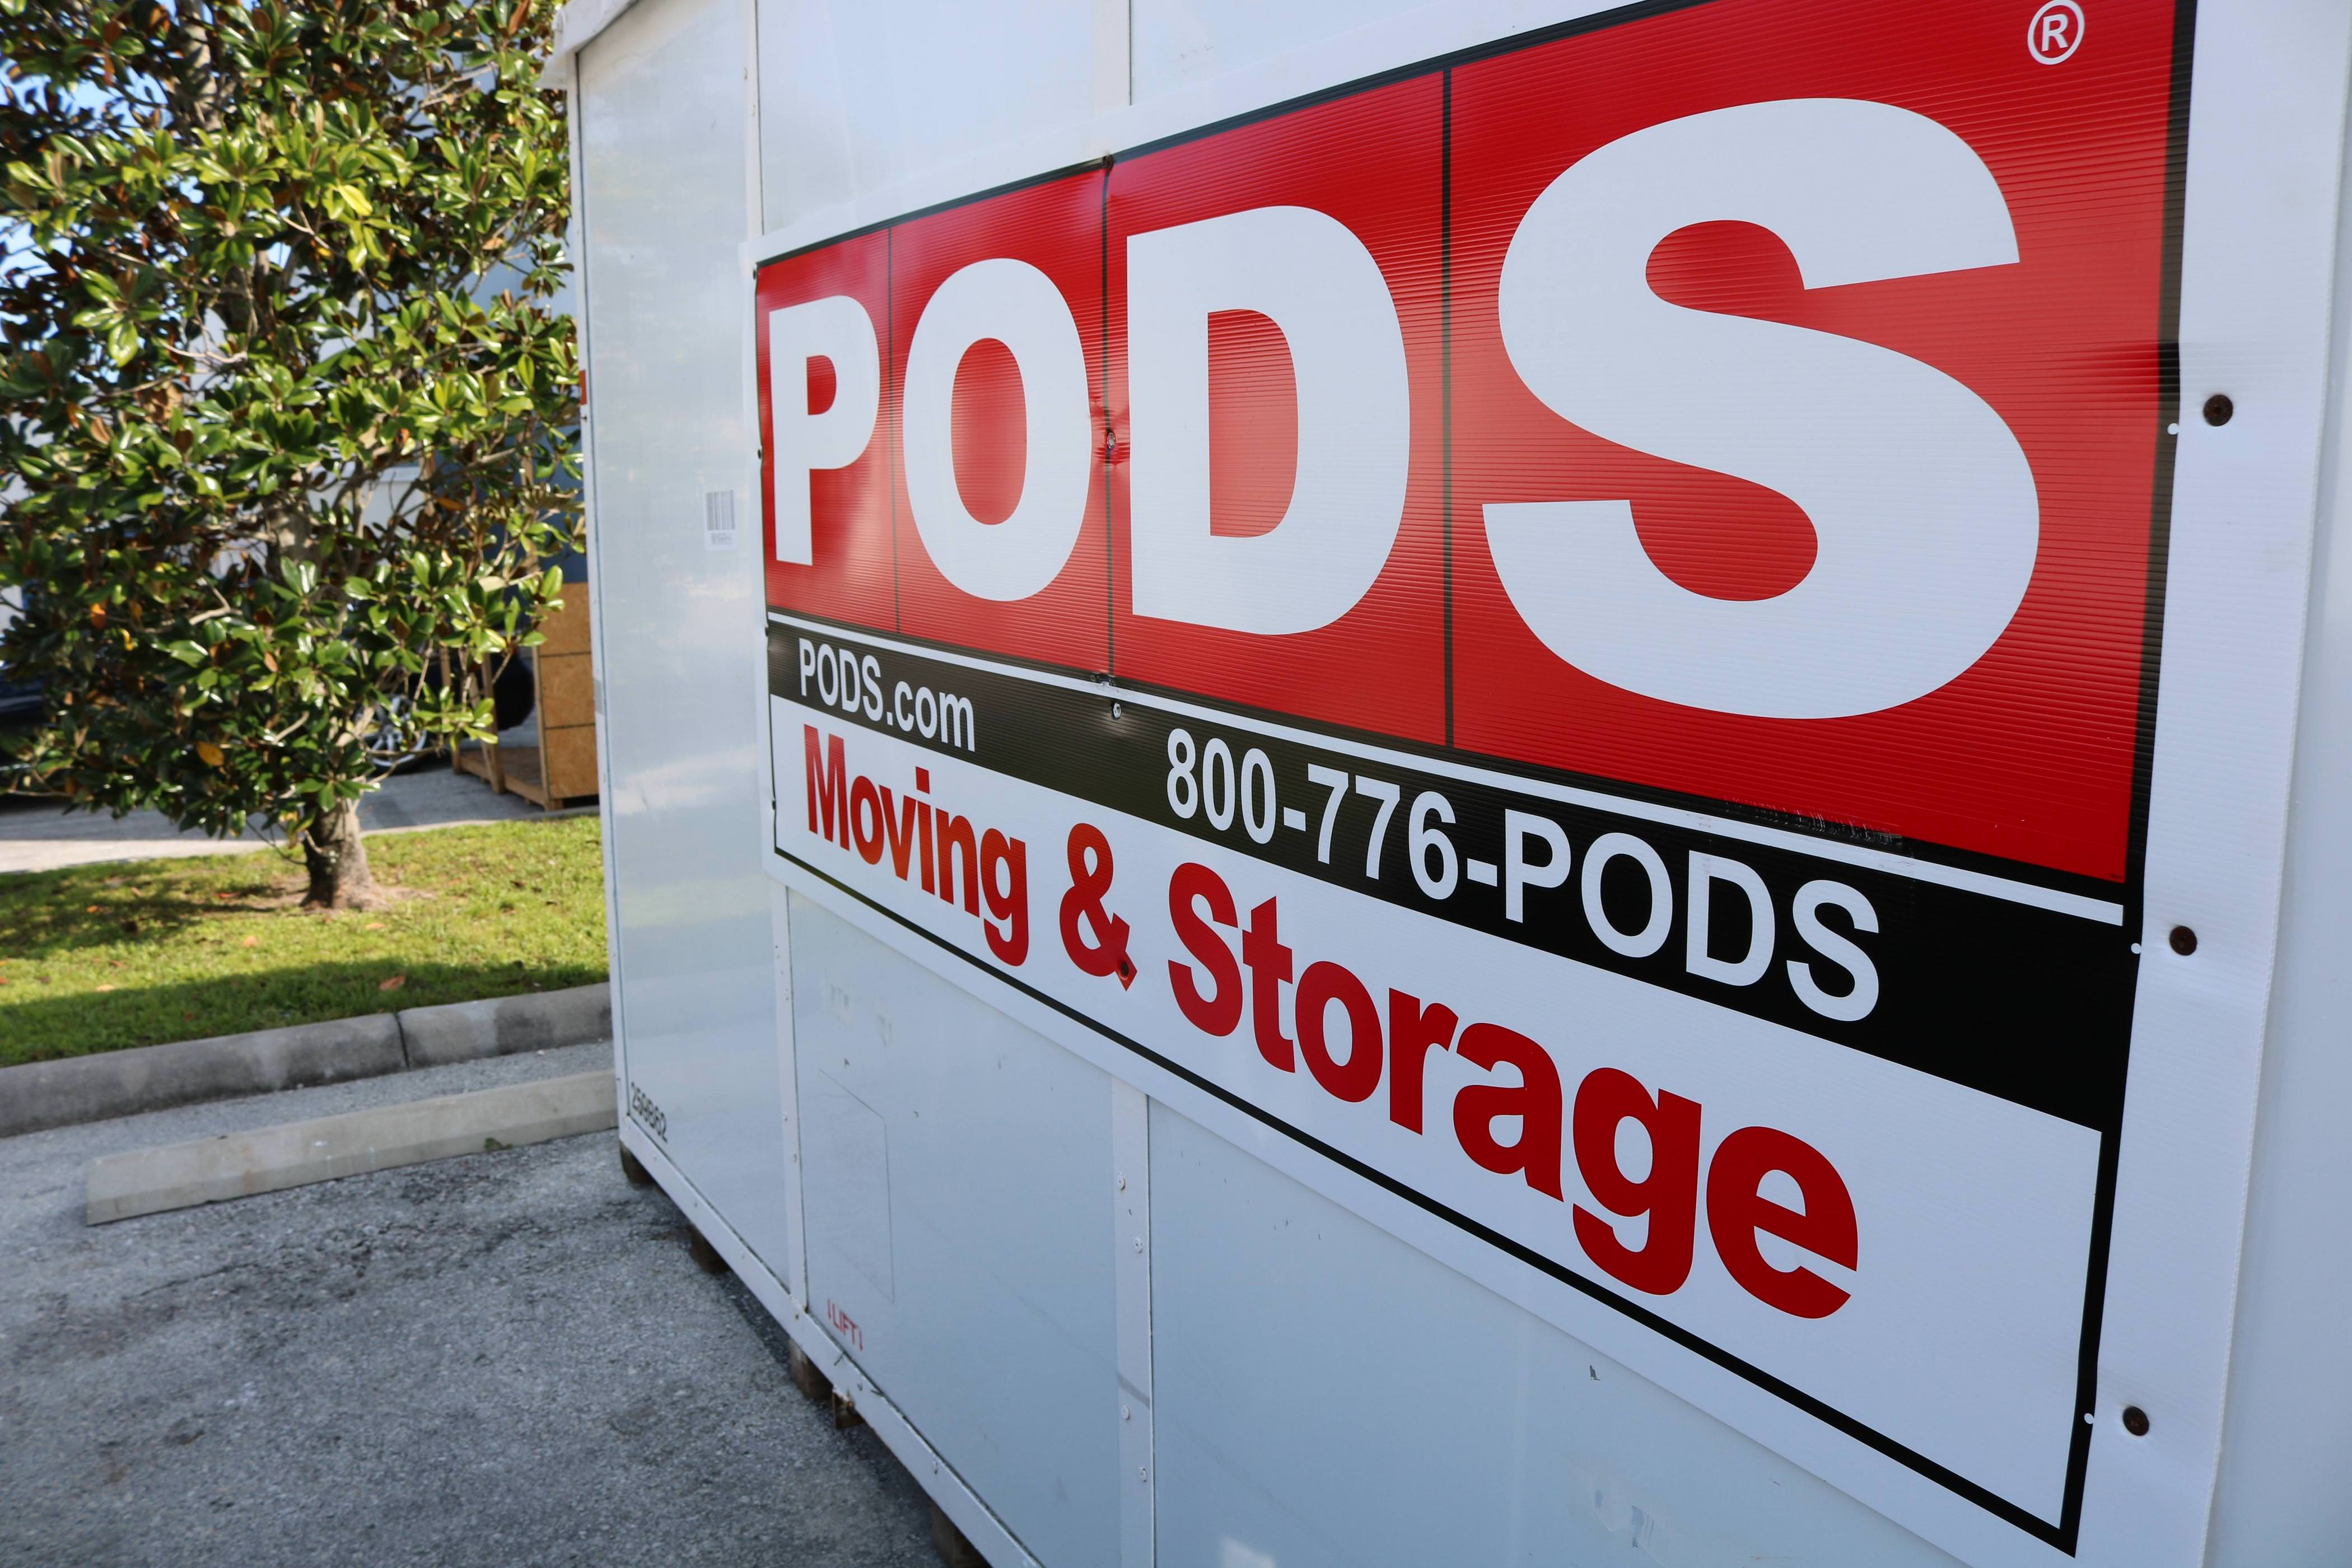 PODS - Compton, CA